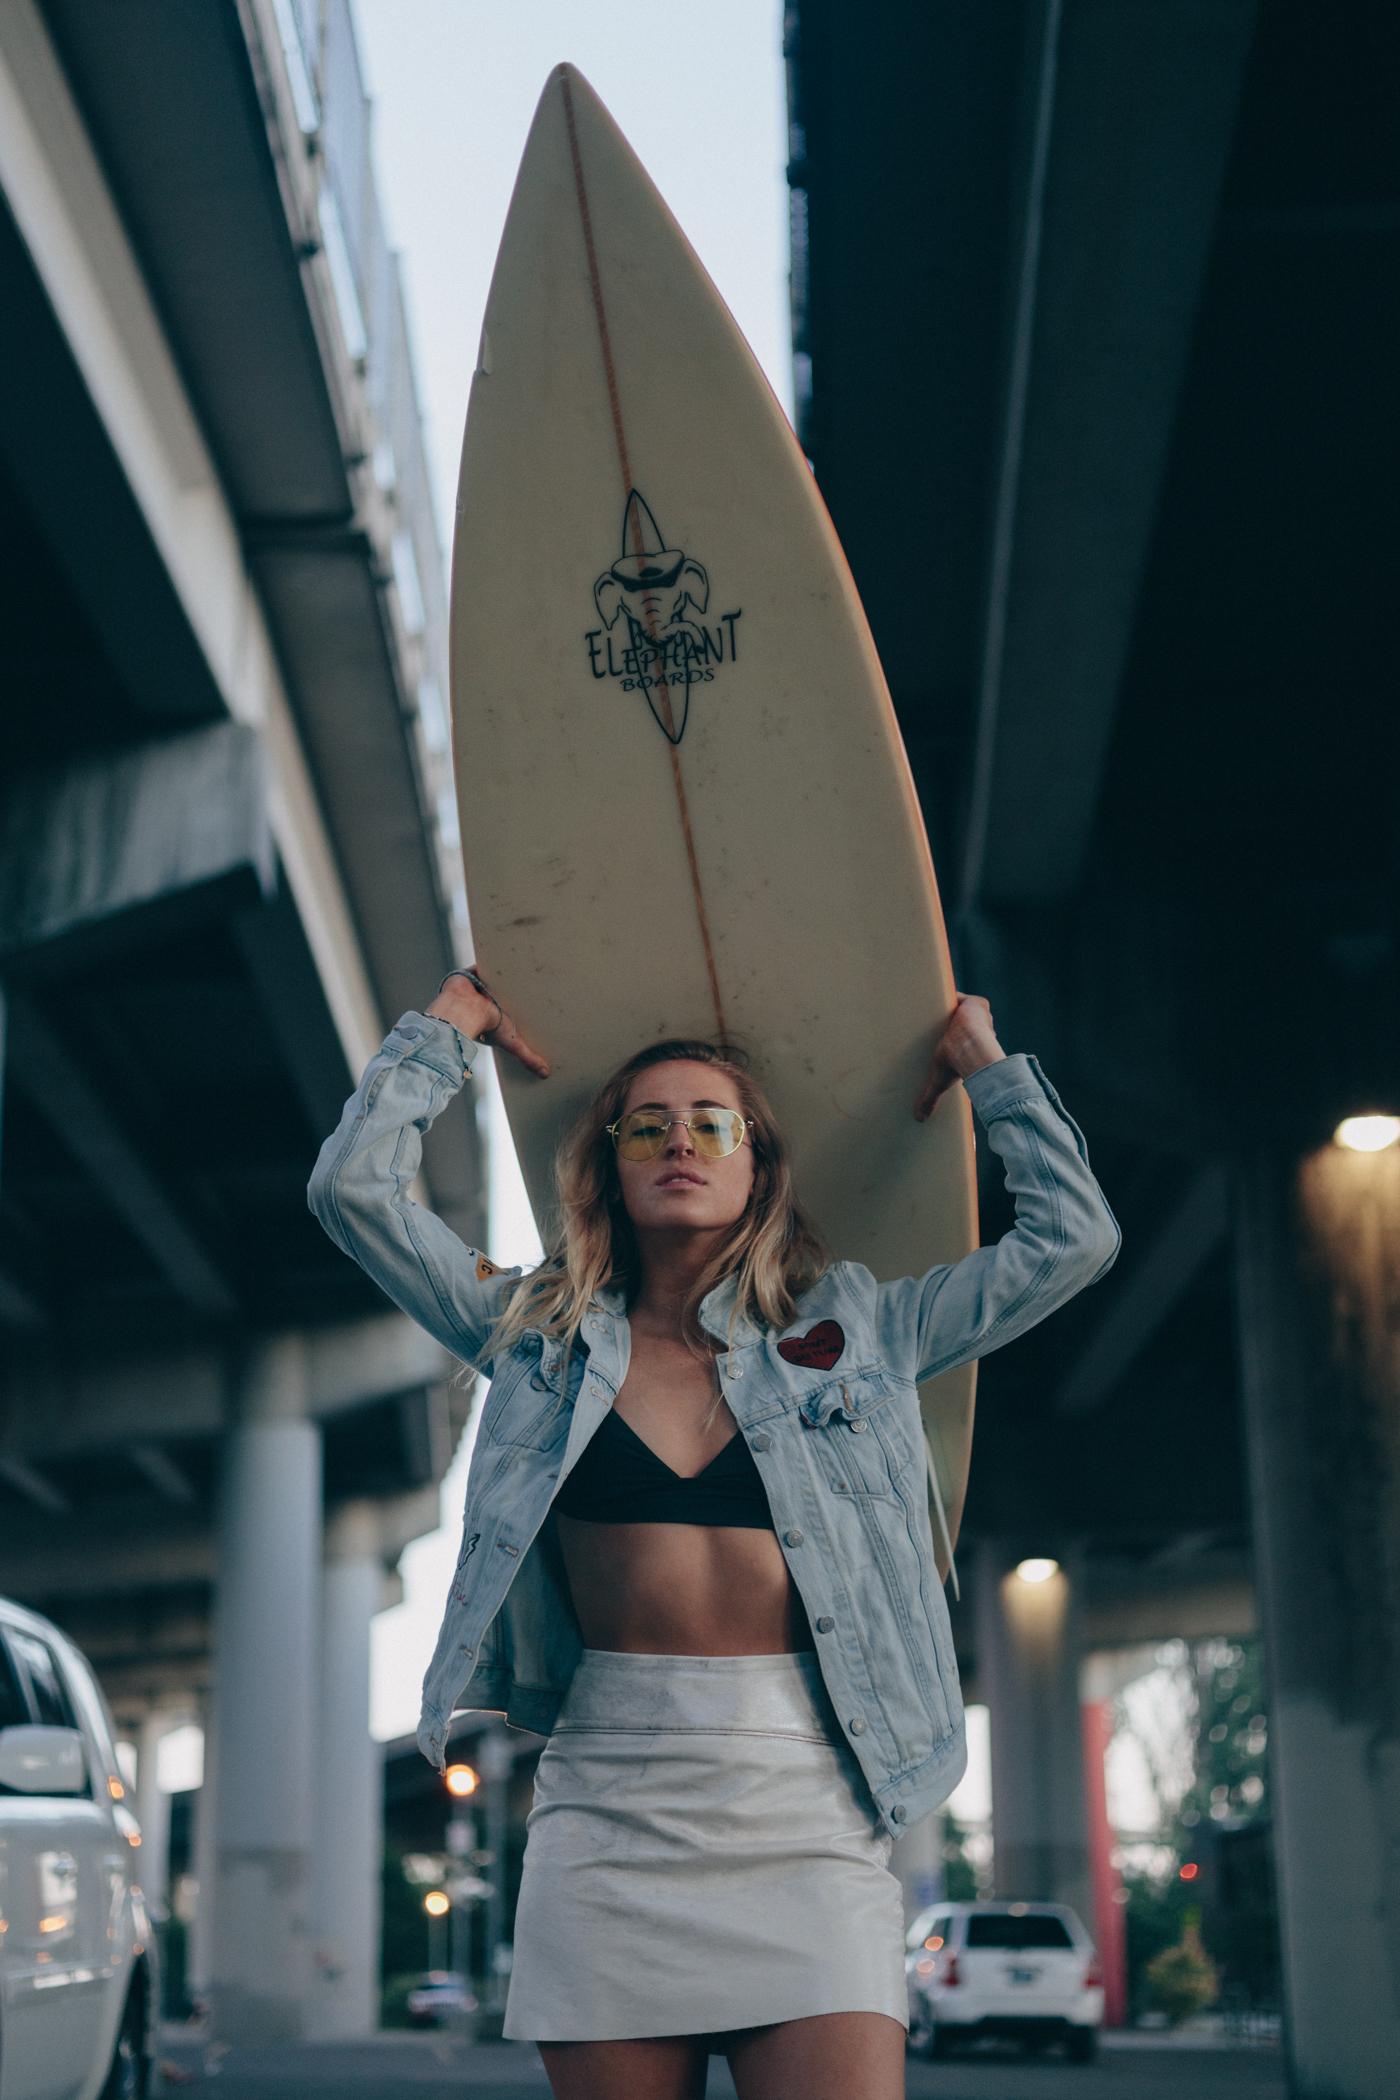 brenna-urban-surfer-36.jpg